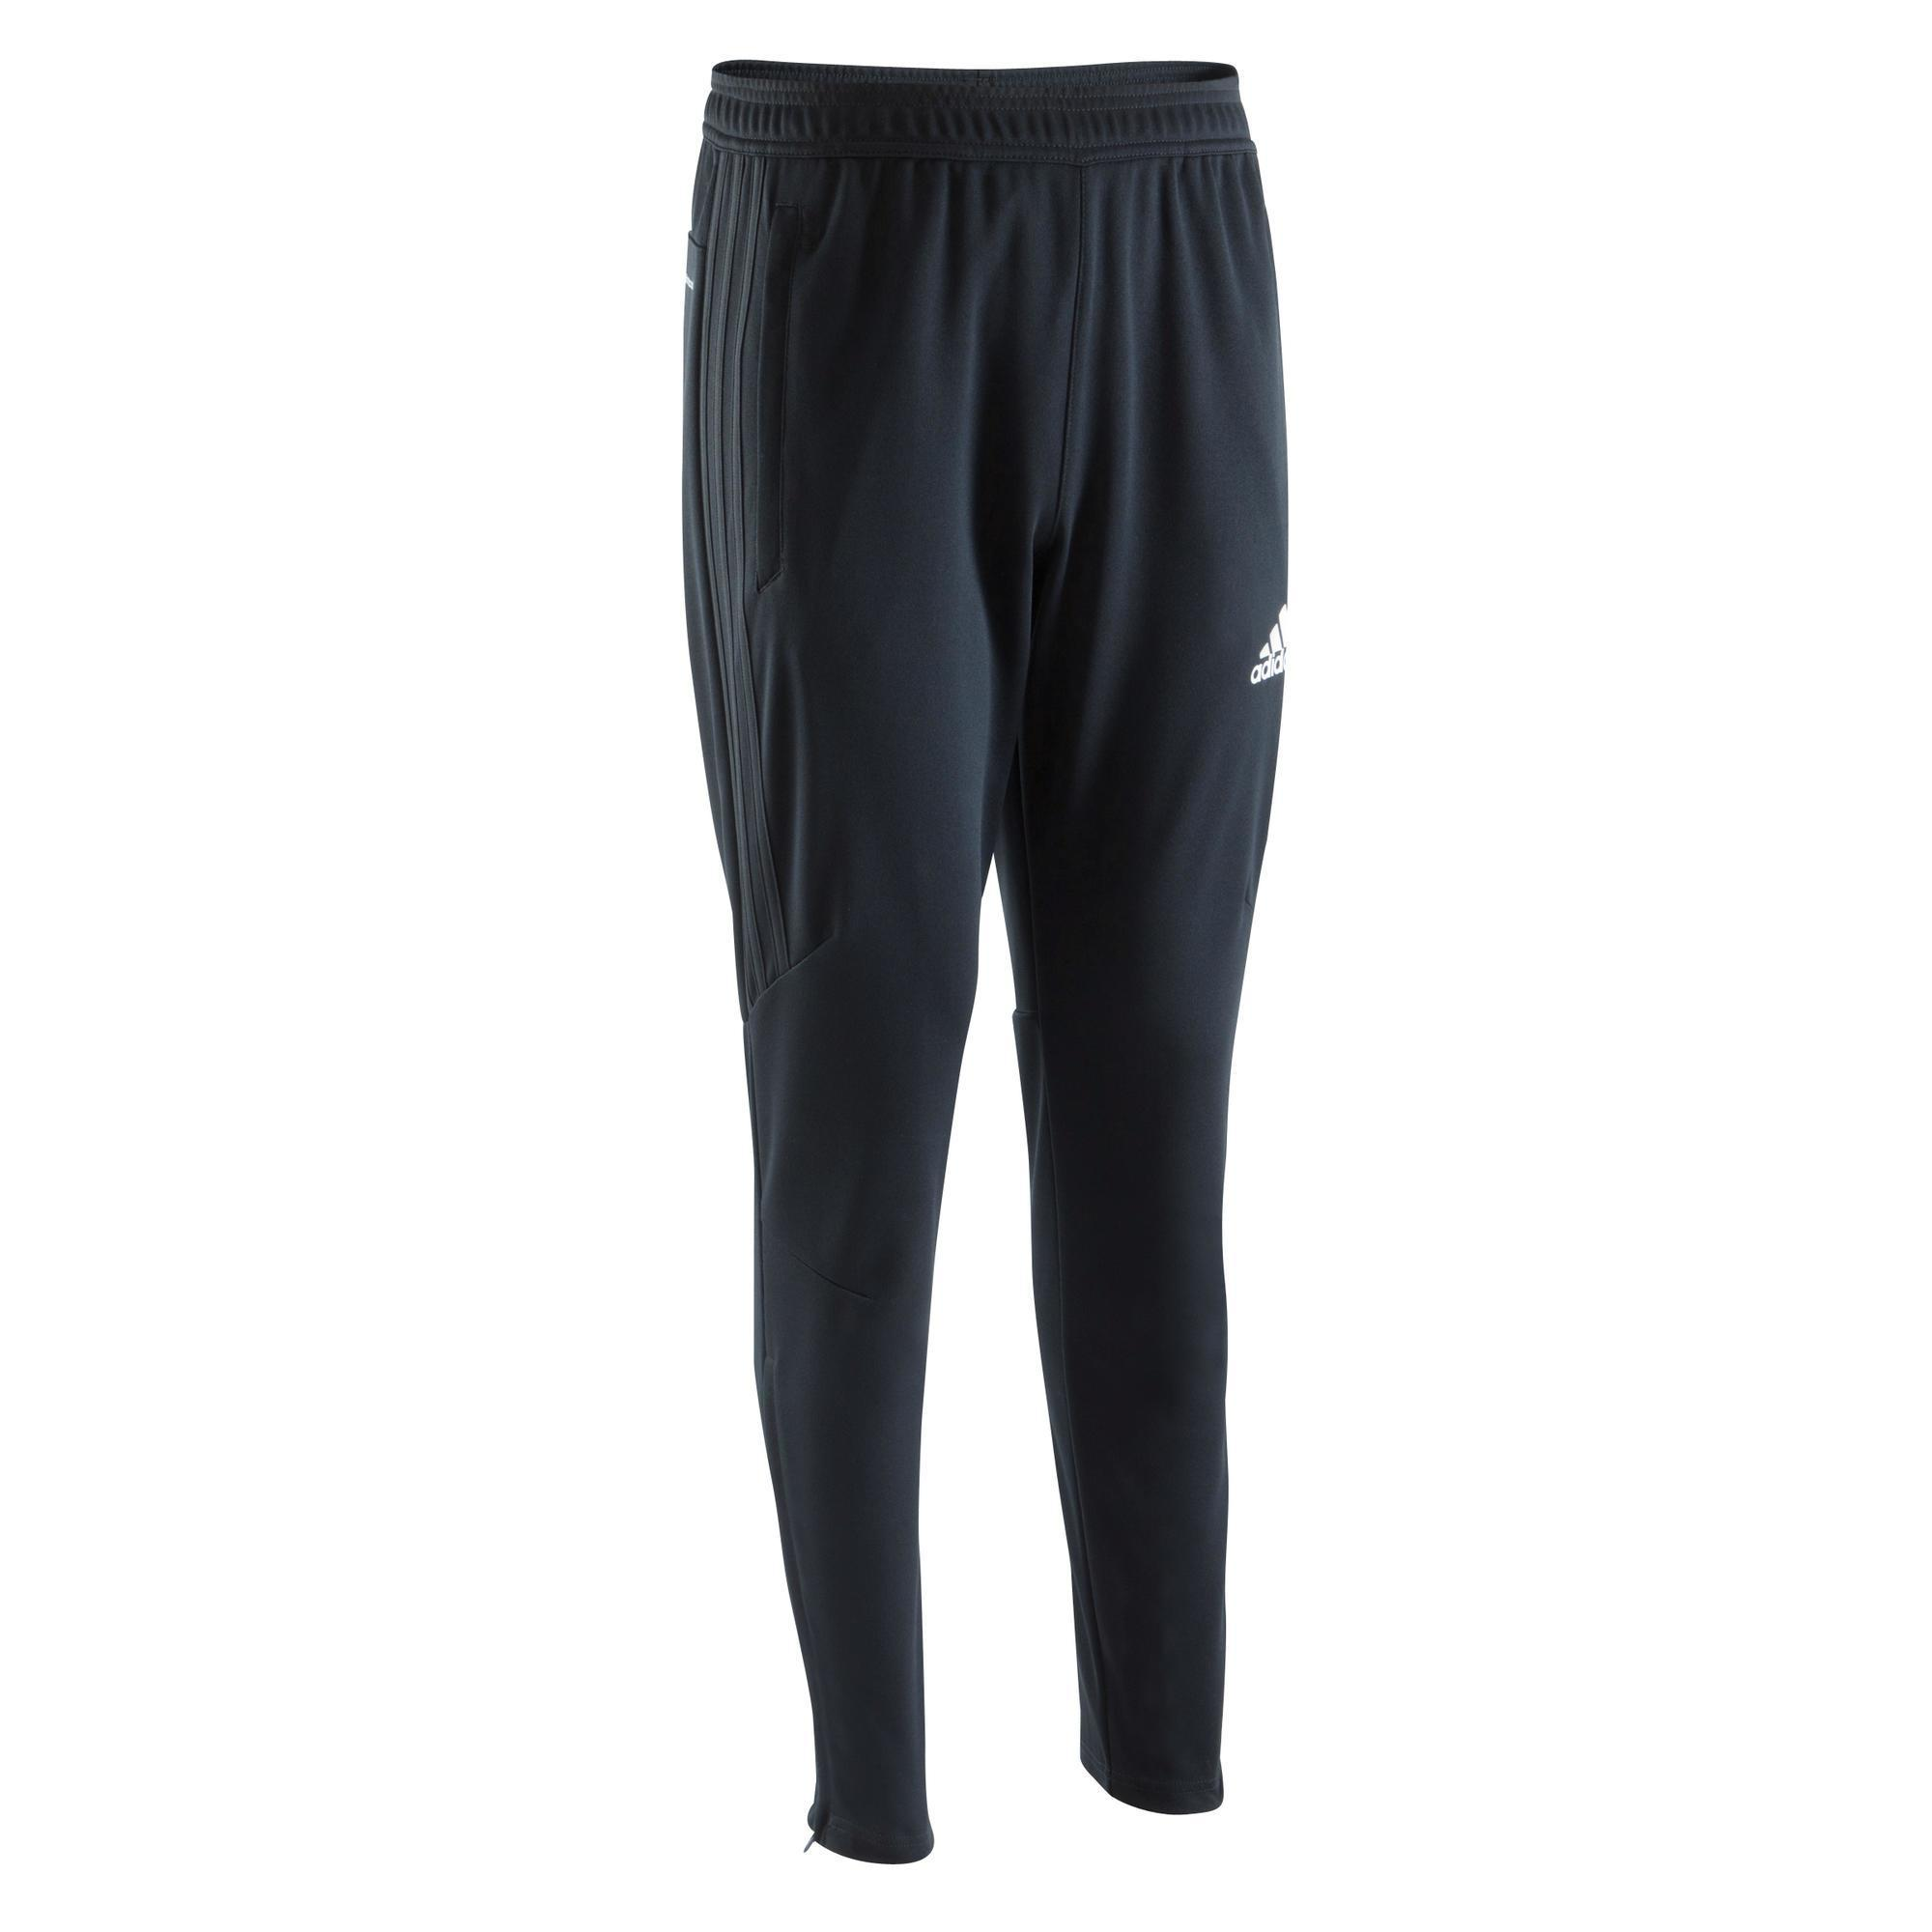 Pantalones Adidas - Decathlon df8b5756d2d1e